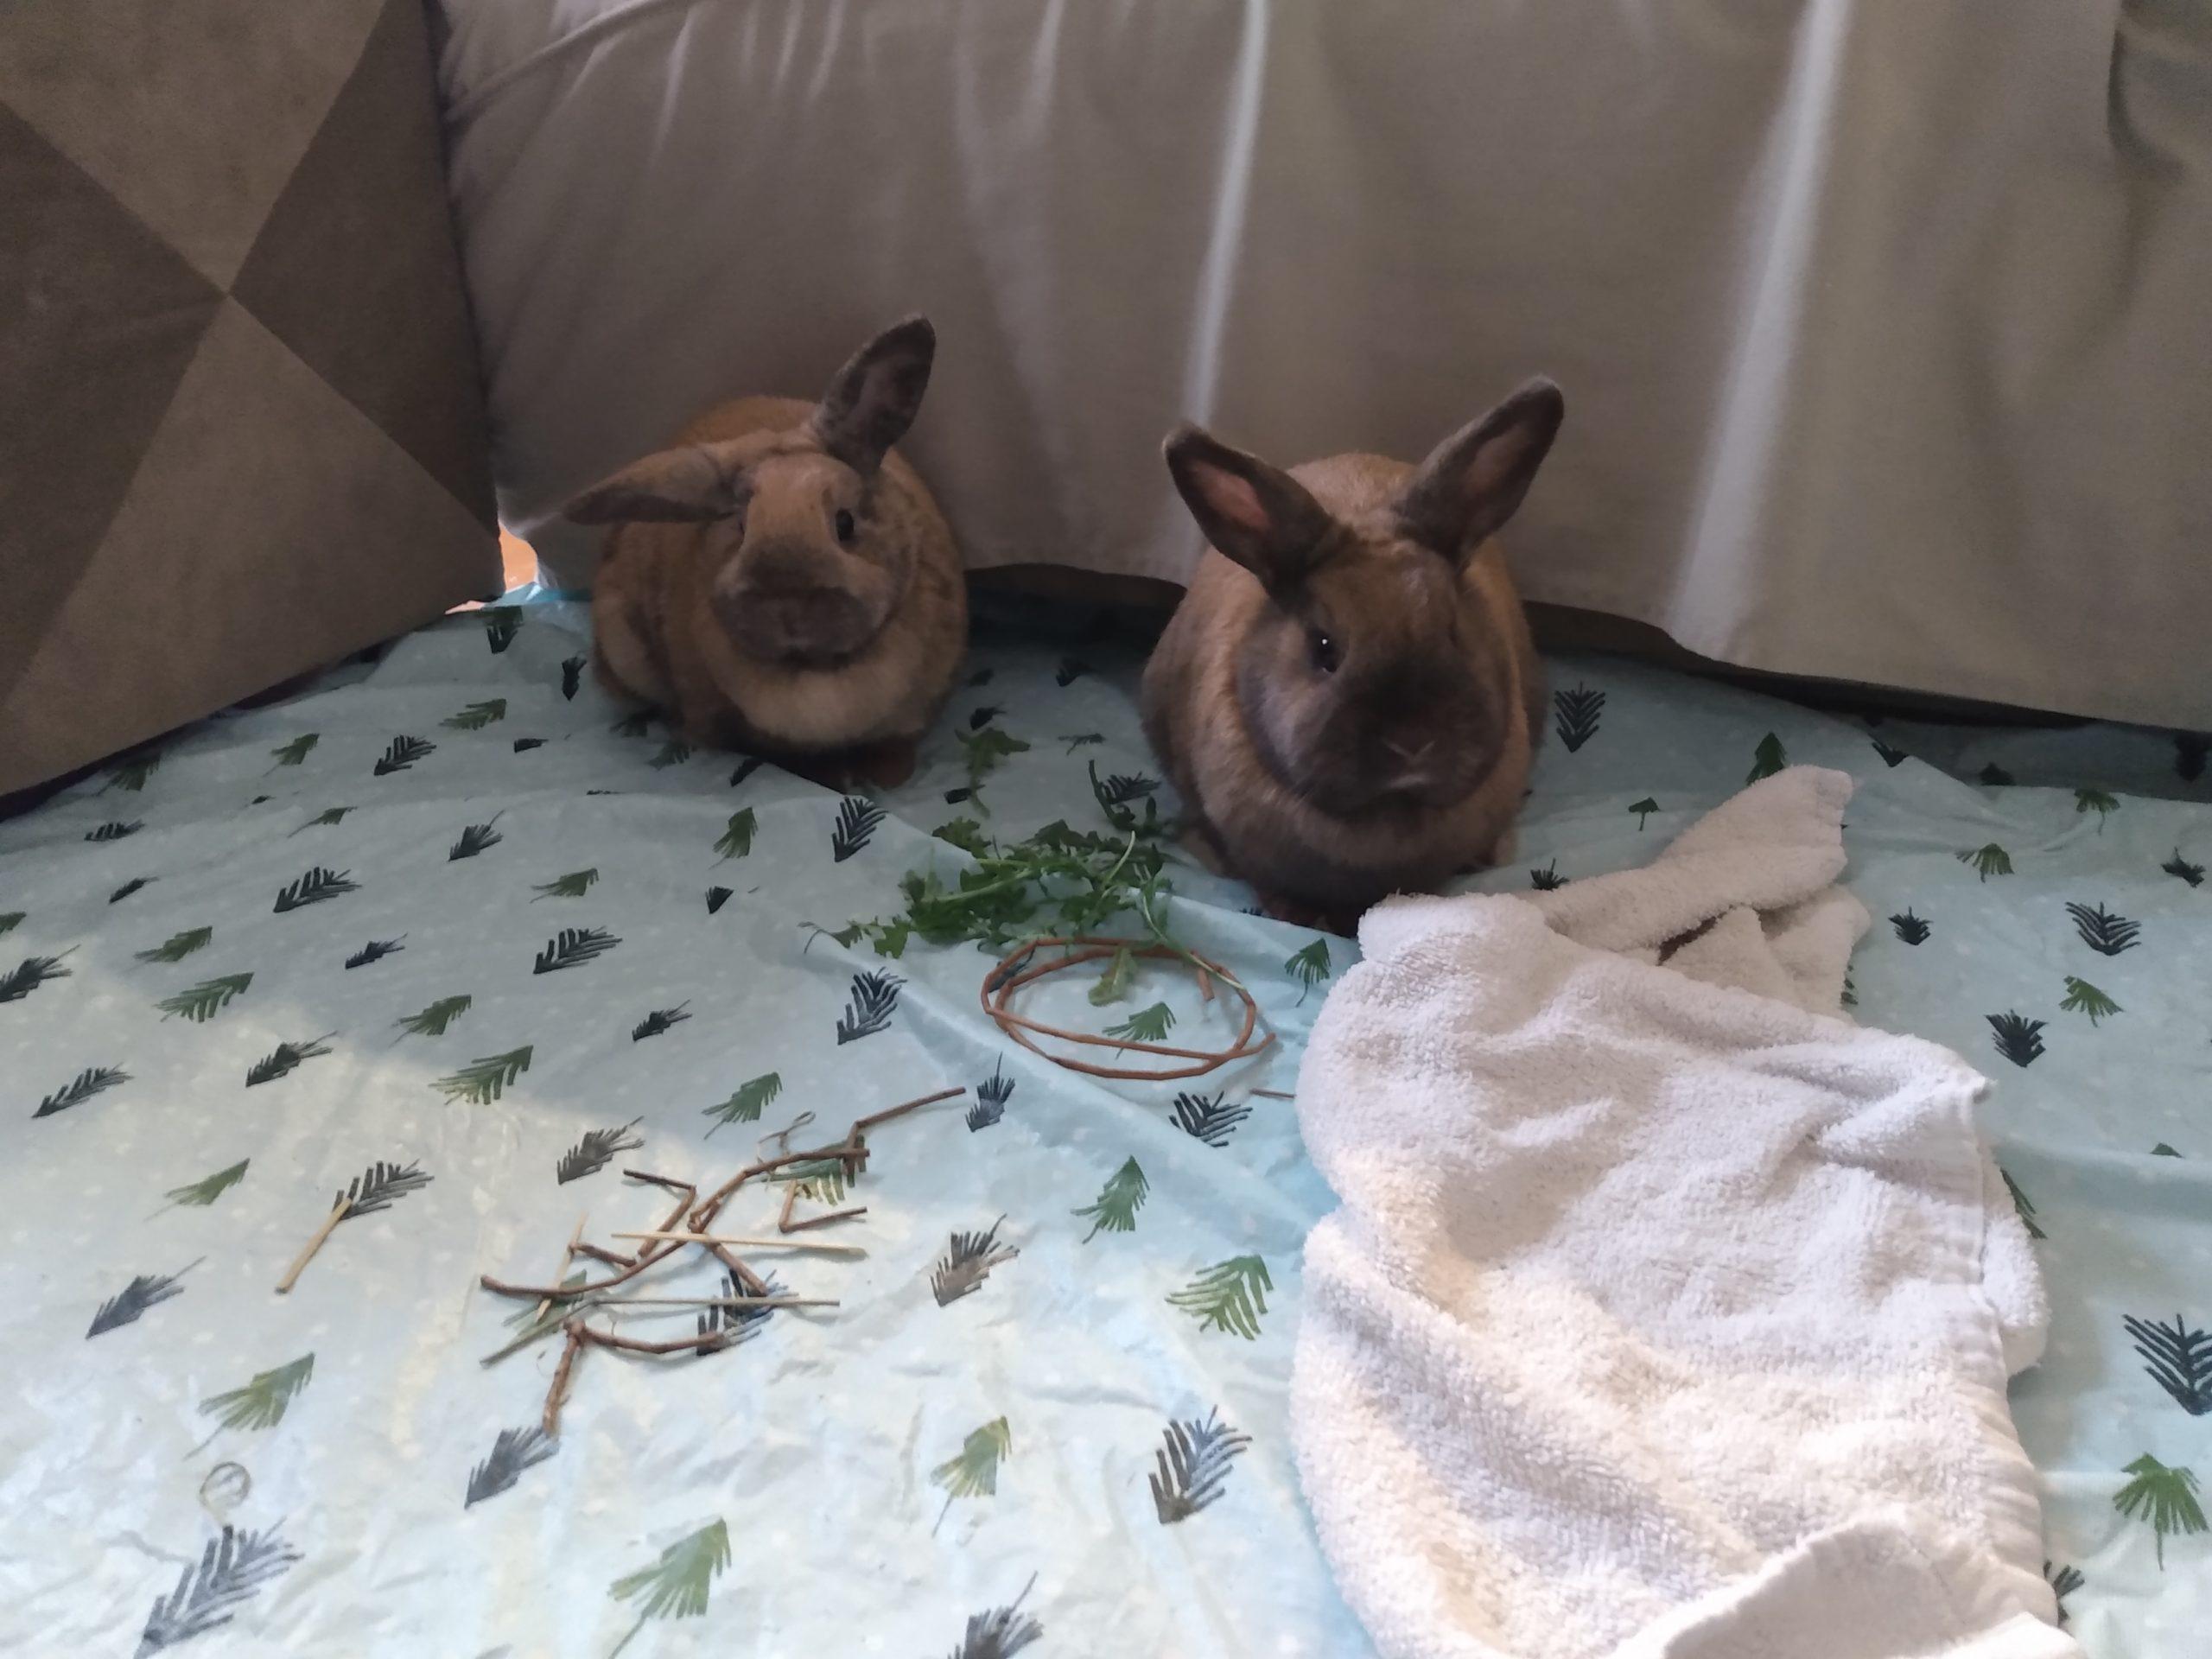 Two members rabbits hopping around.